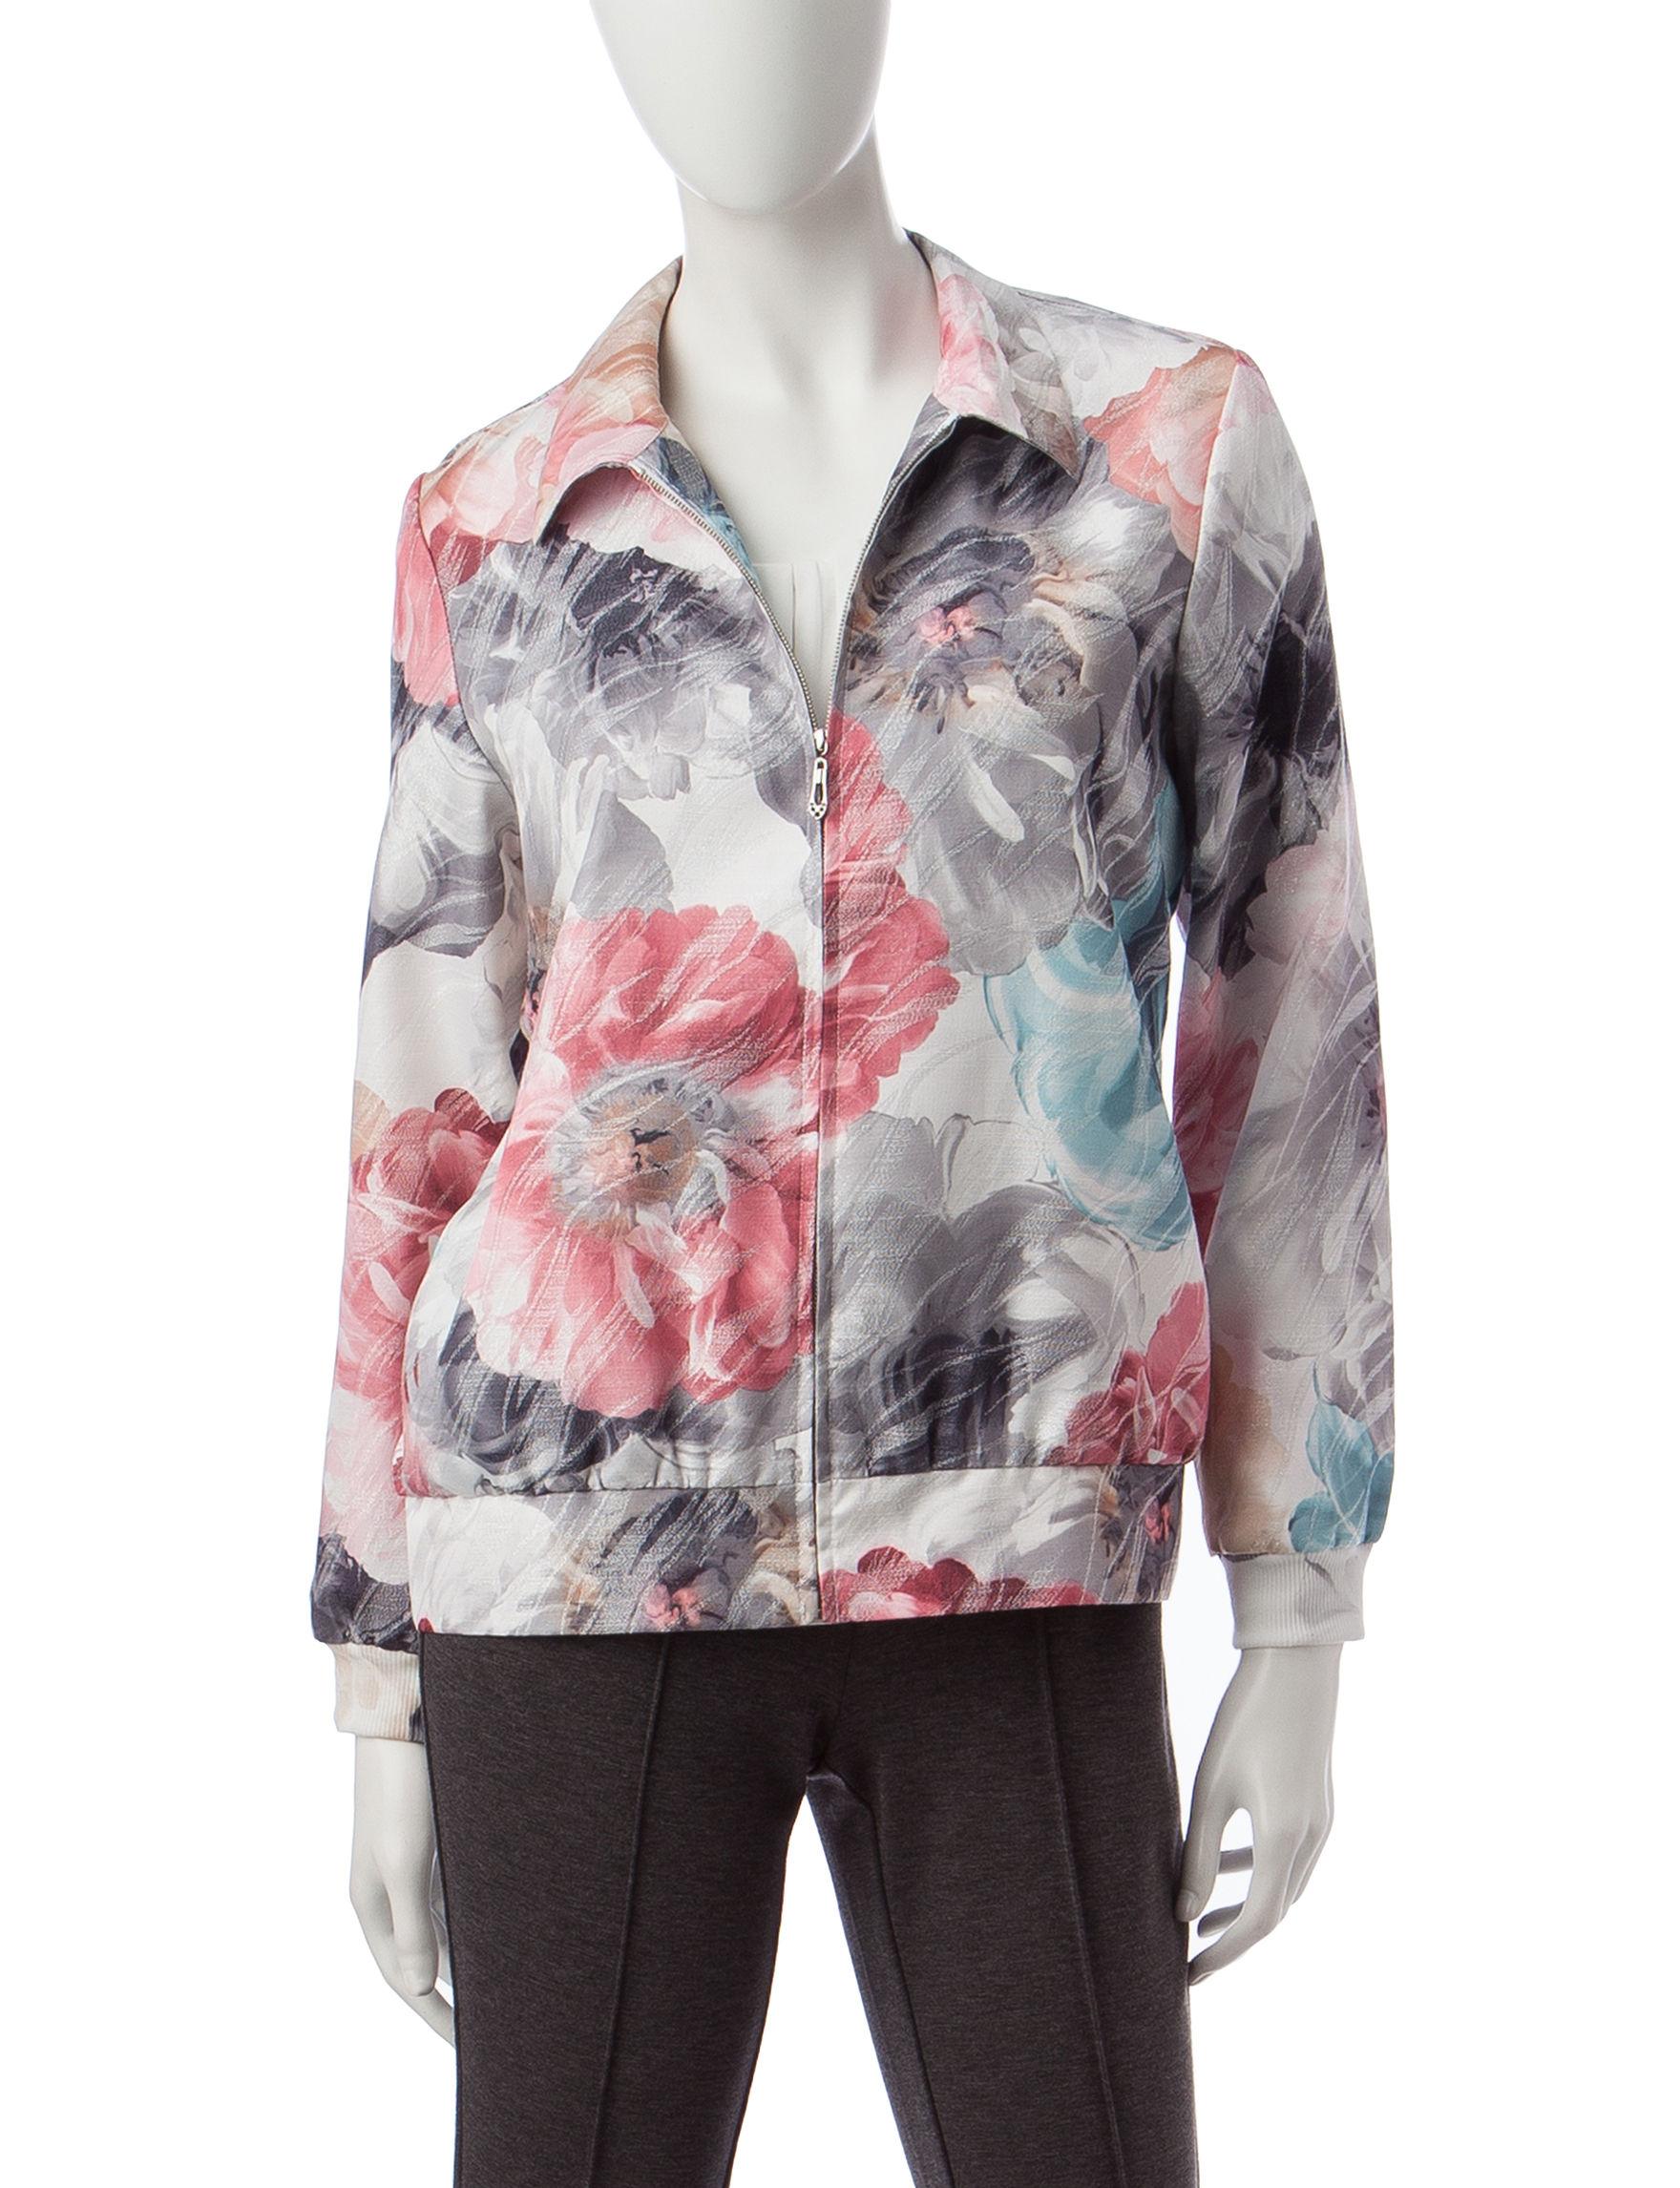 Alfred Dunner Multi Lightweight Jackets & Blazers